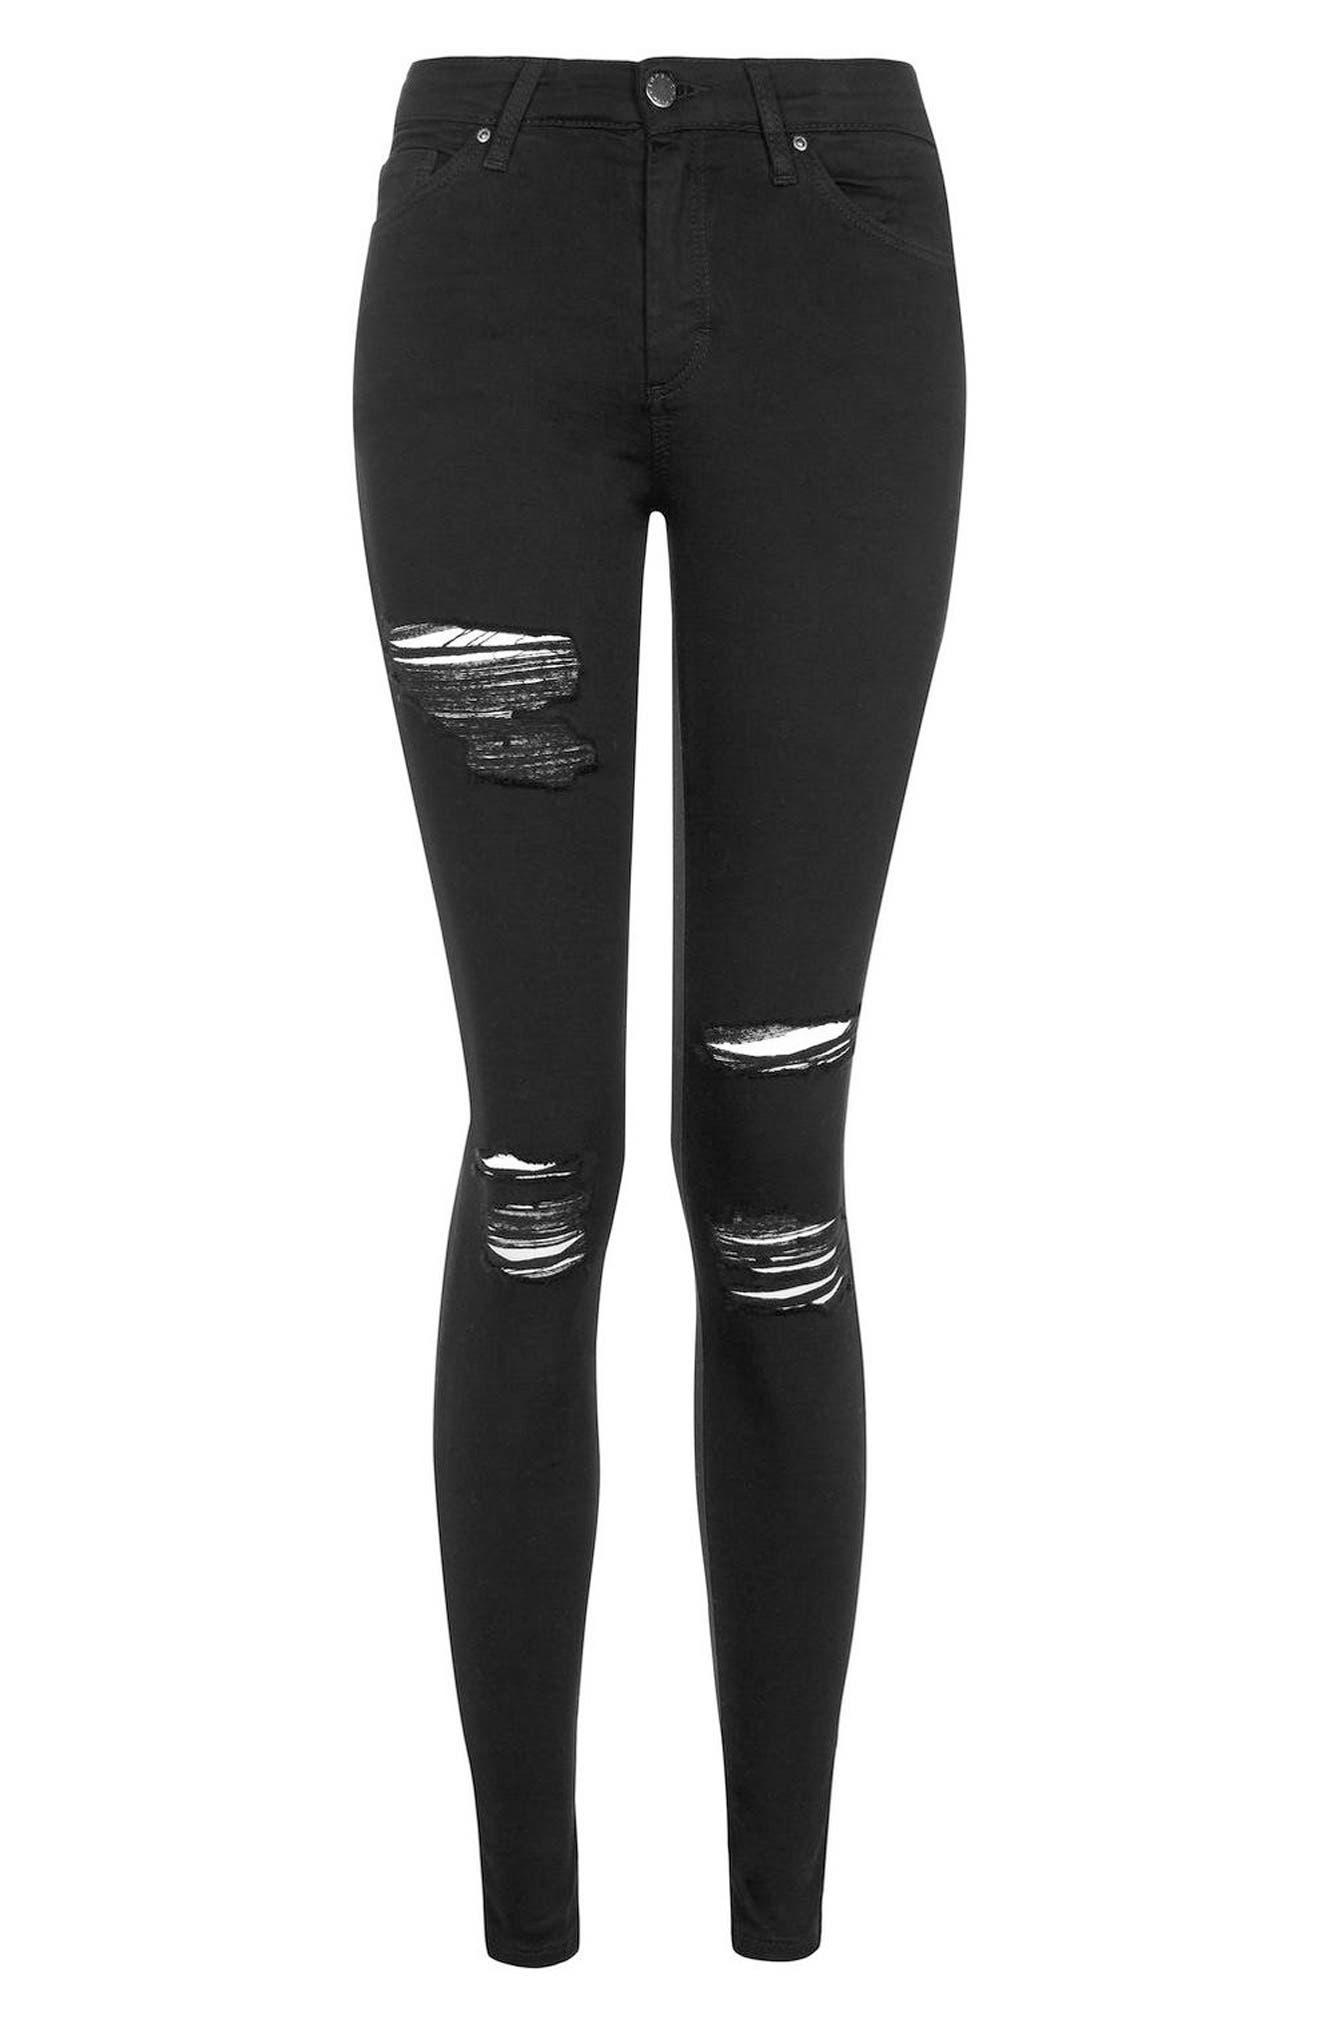 MOTO Leigh Super Rip Jeans,                             Alternate thumbnail 4, color,                             Black